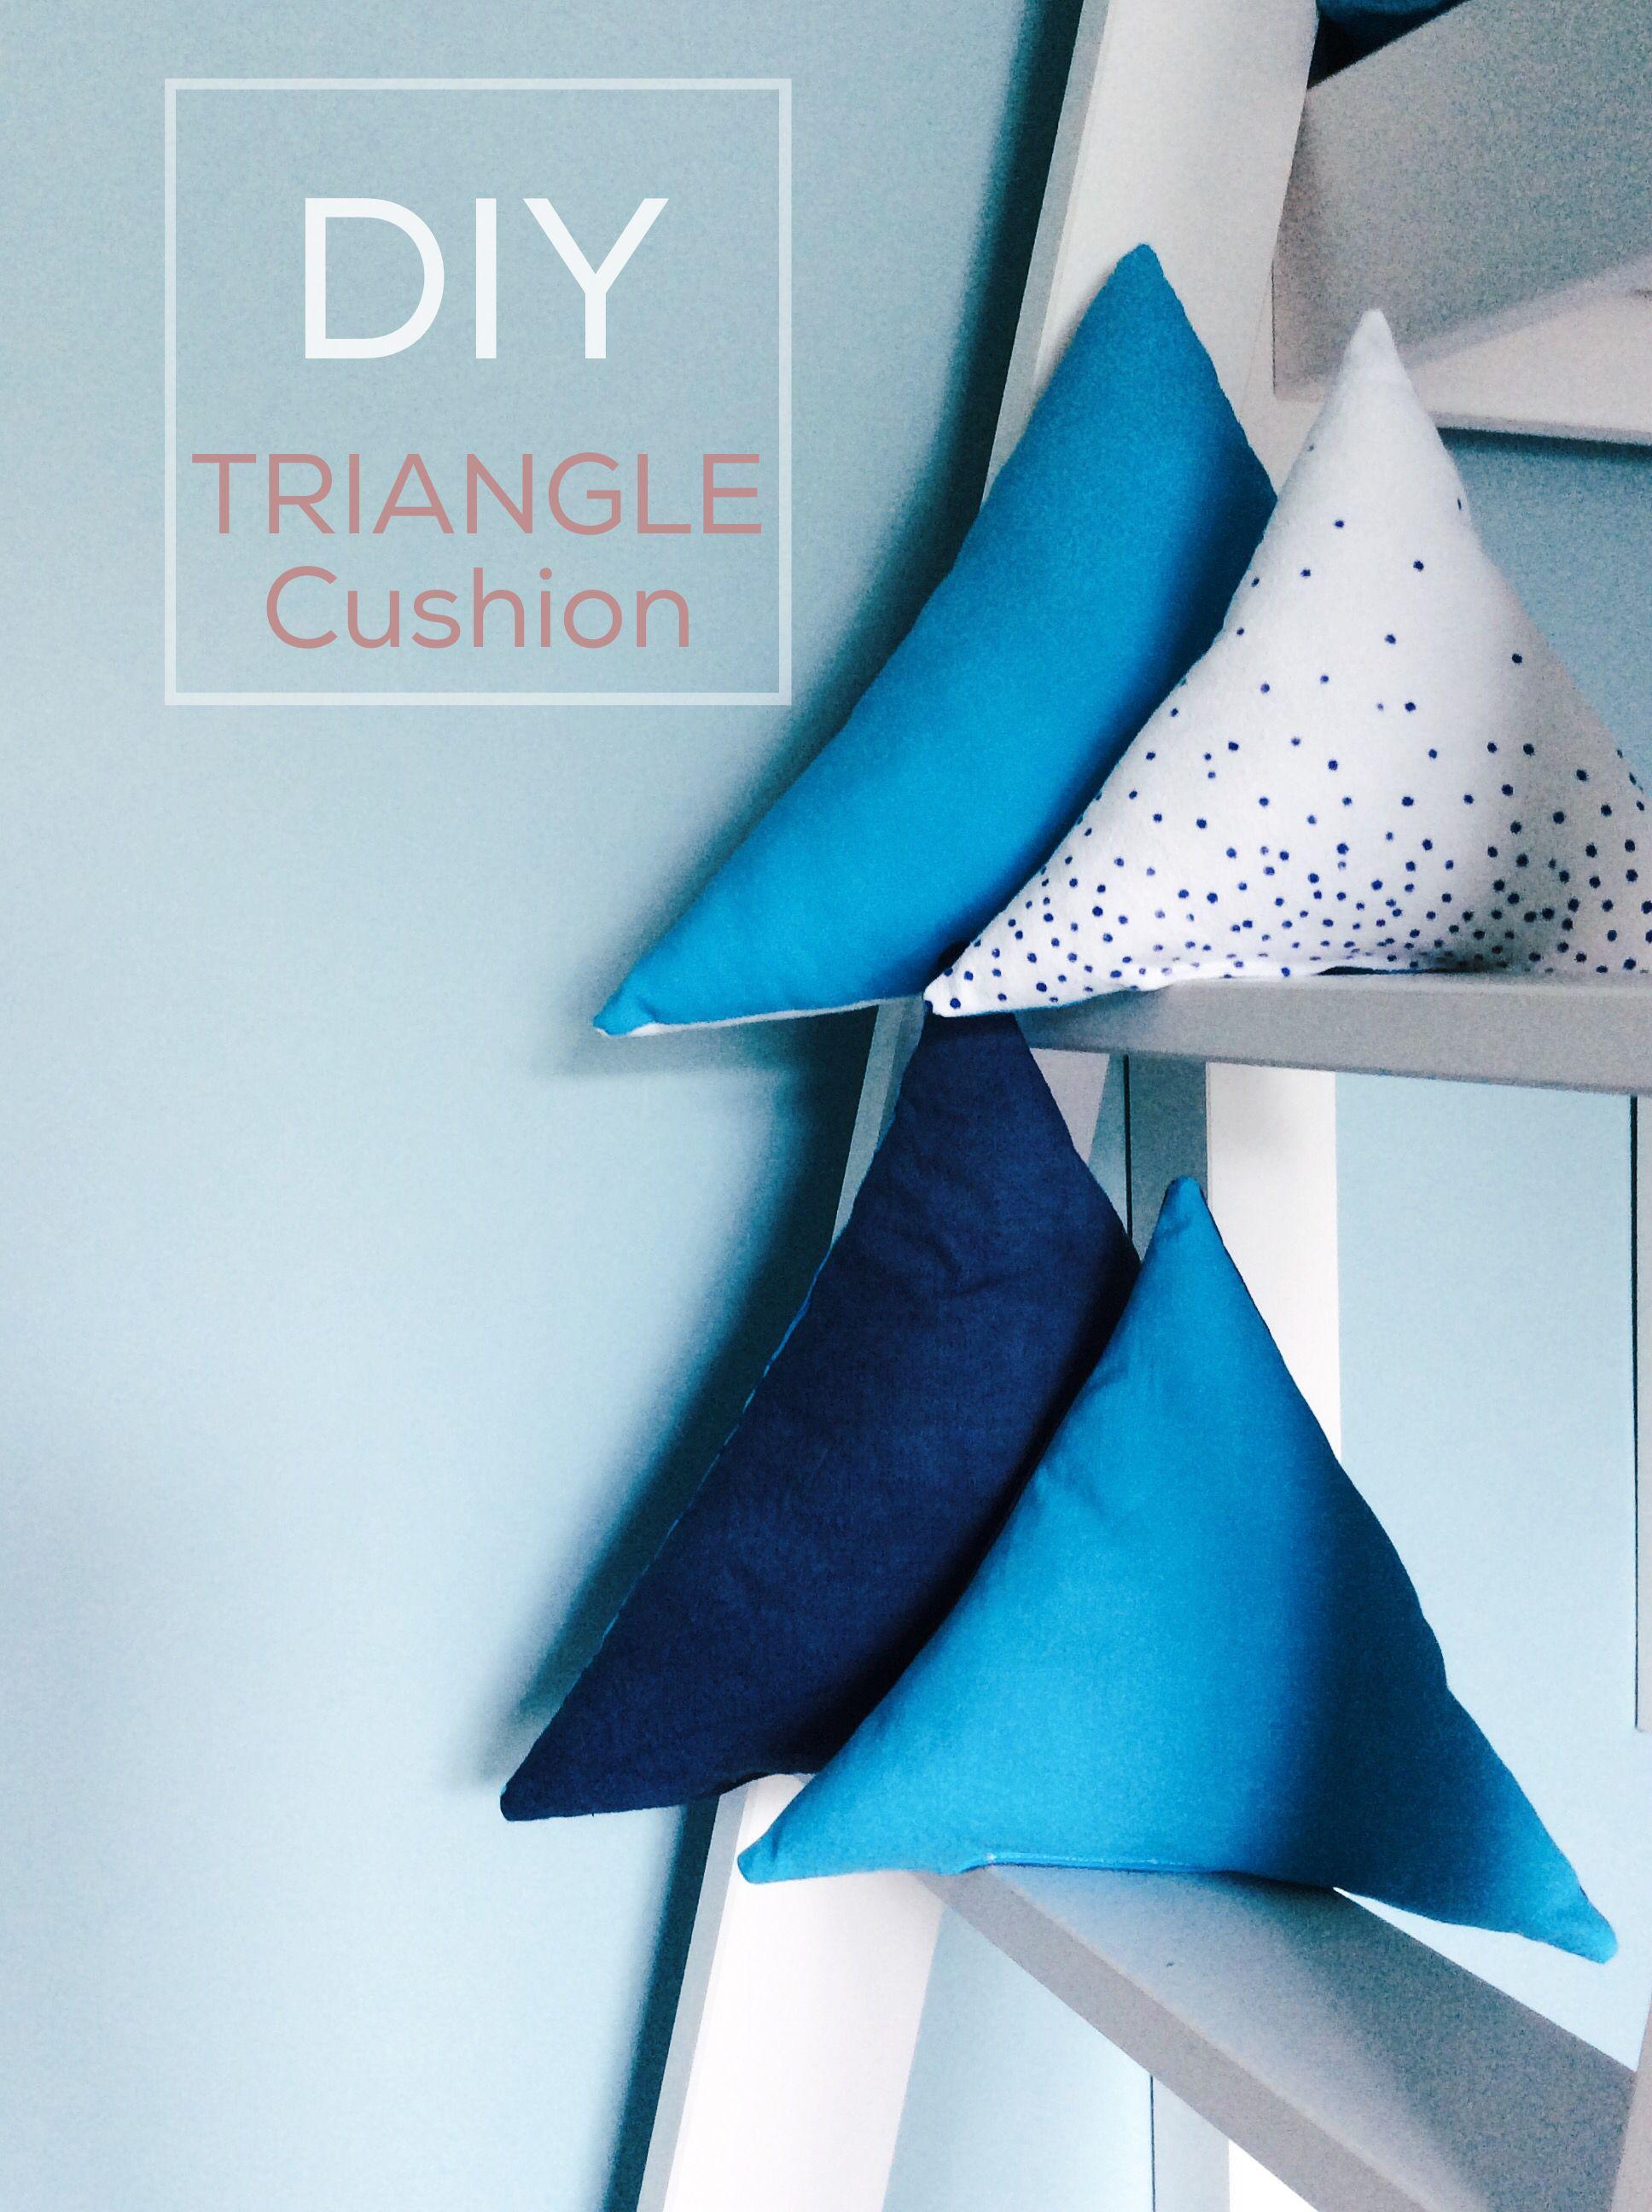 DIY triangle cushion sewing Tutorial // Nähanleitung Dreieck-Kissen // Upcycling by knobz